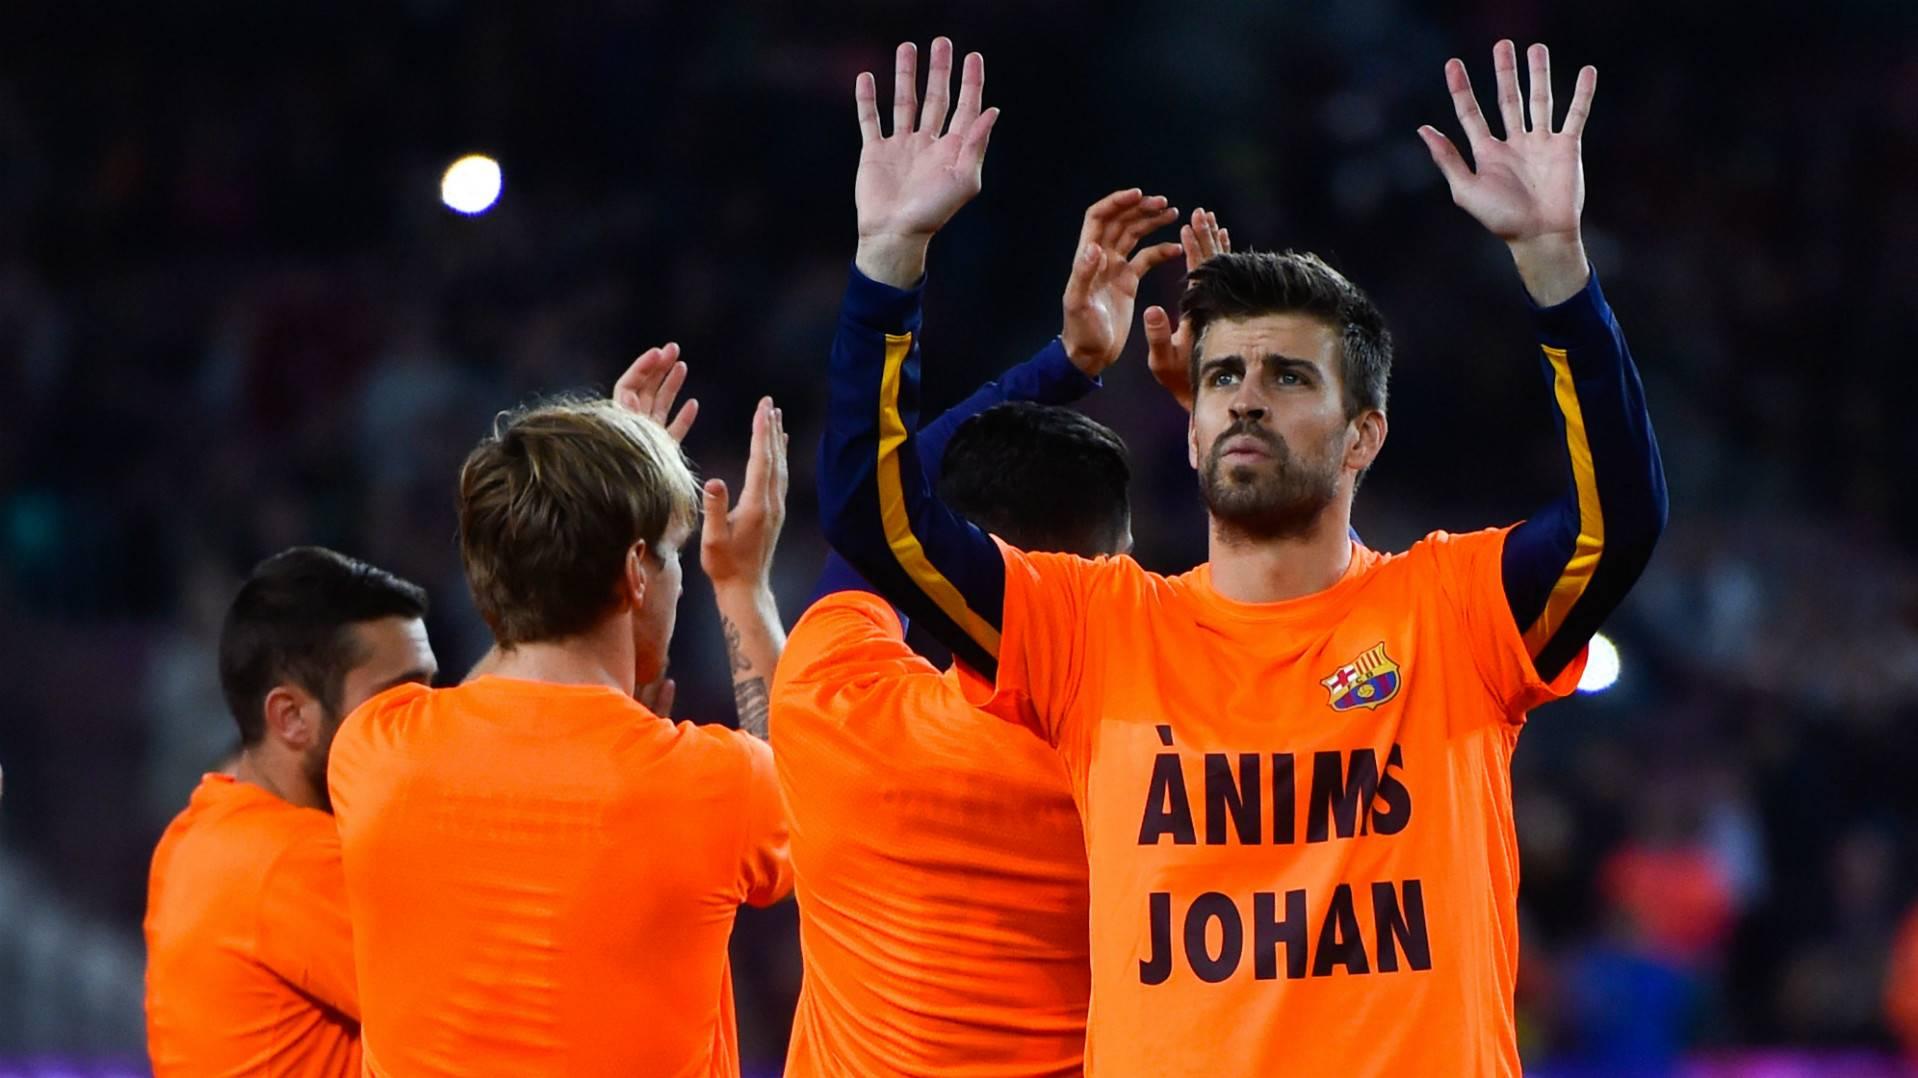 Comunicado del Barça y pésame a la familia Cruyff